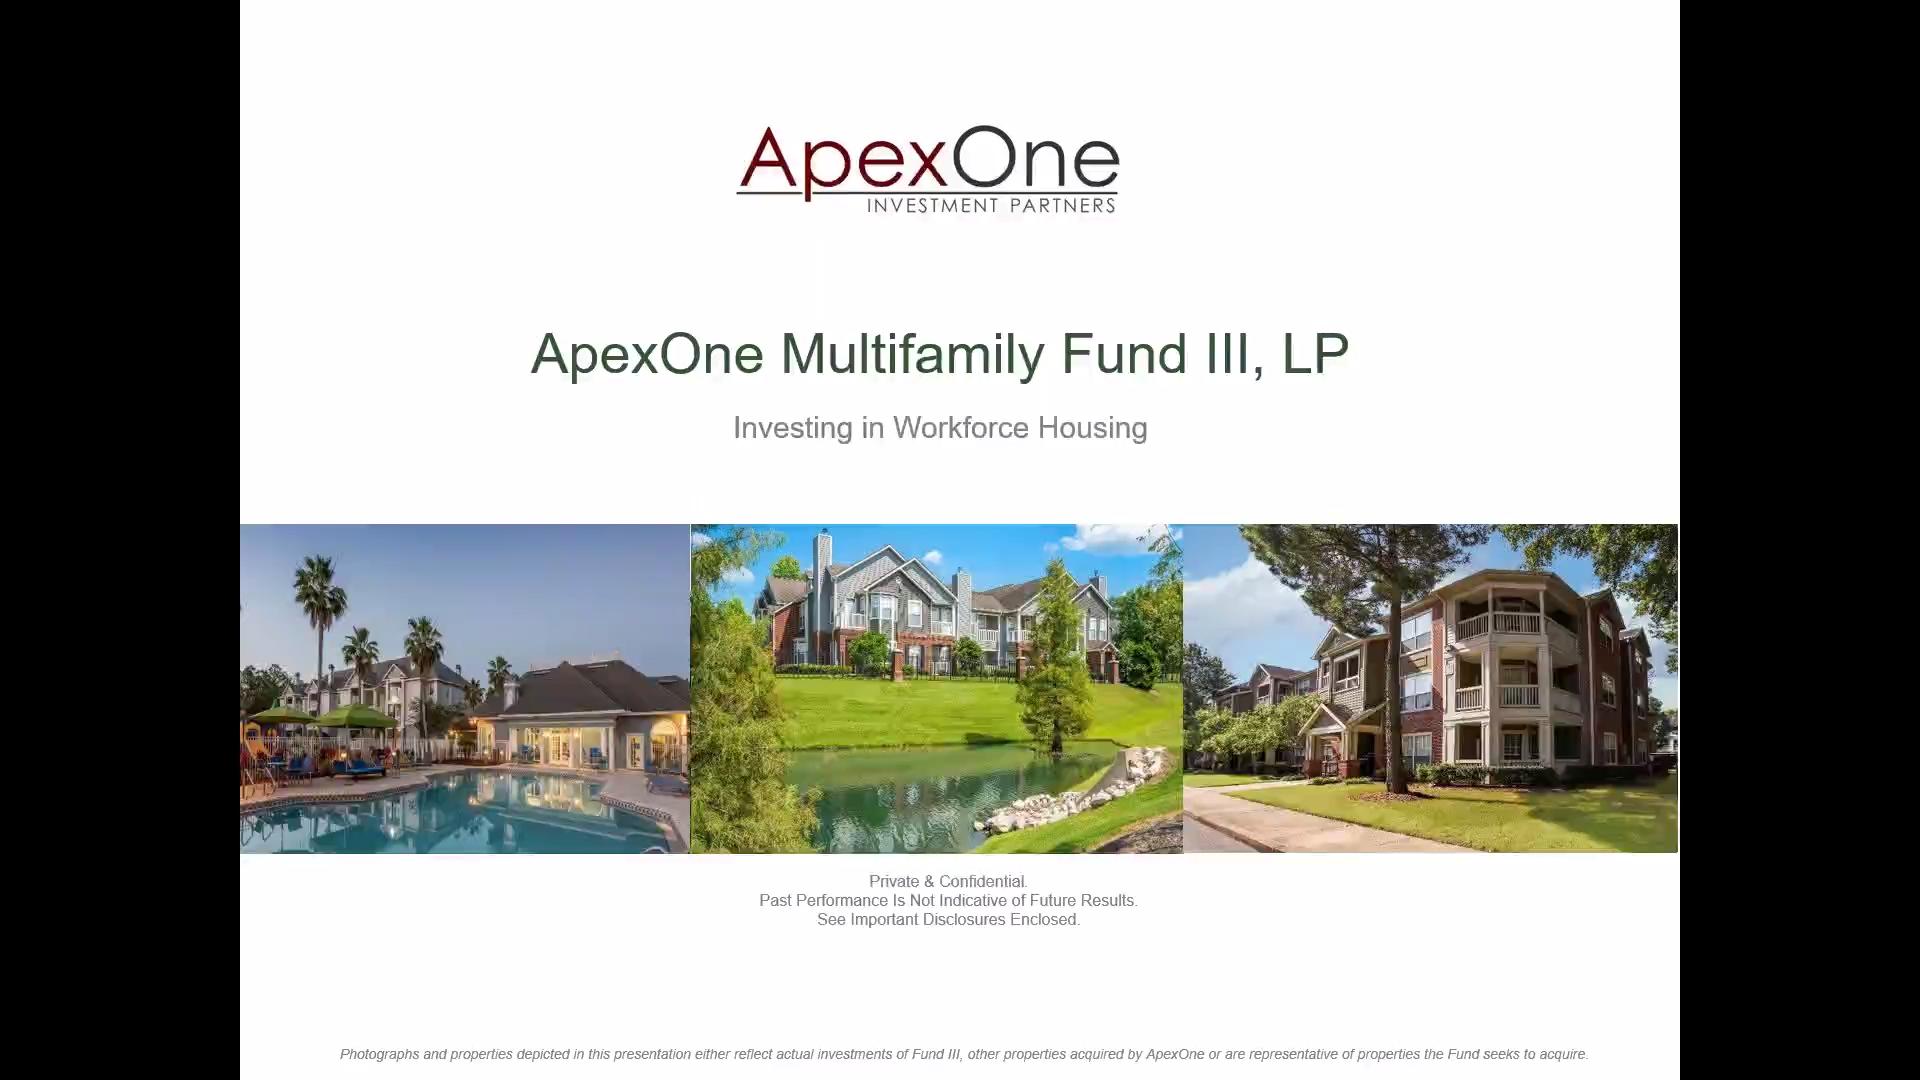 Investment Video - ApexOne Multifamily Fund III, LP